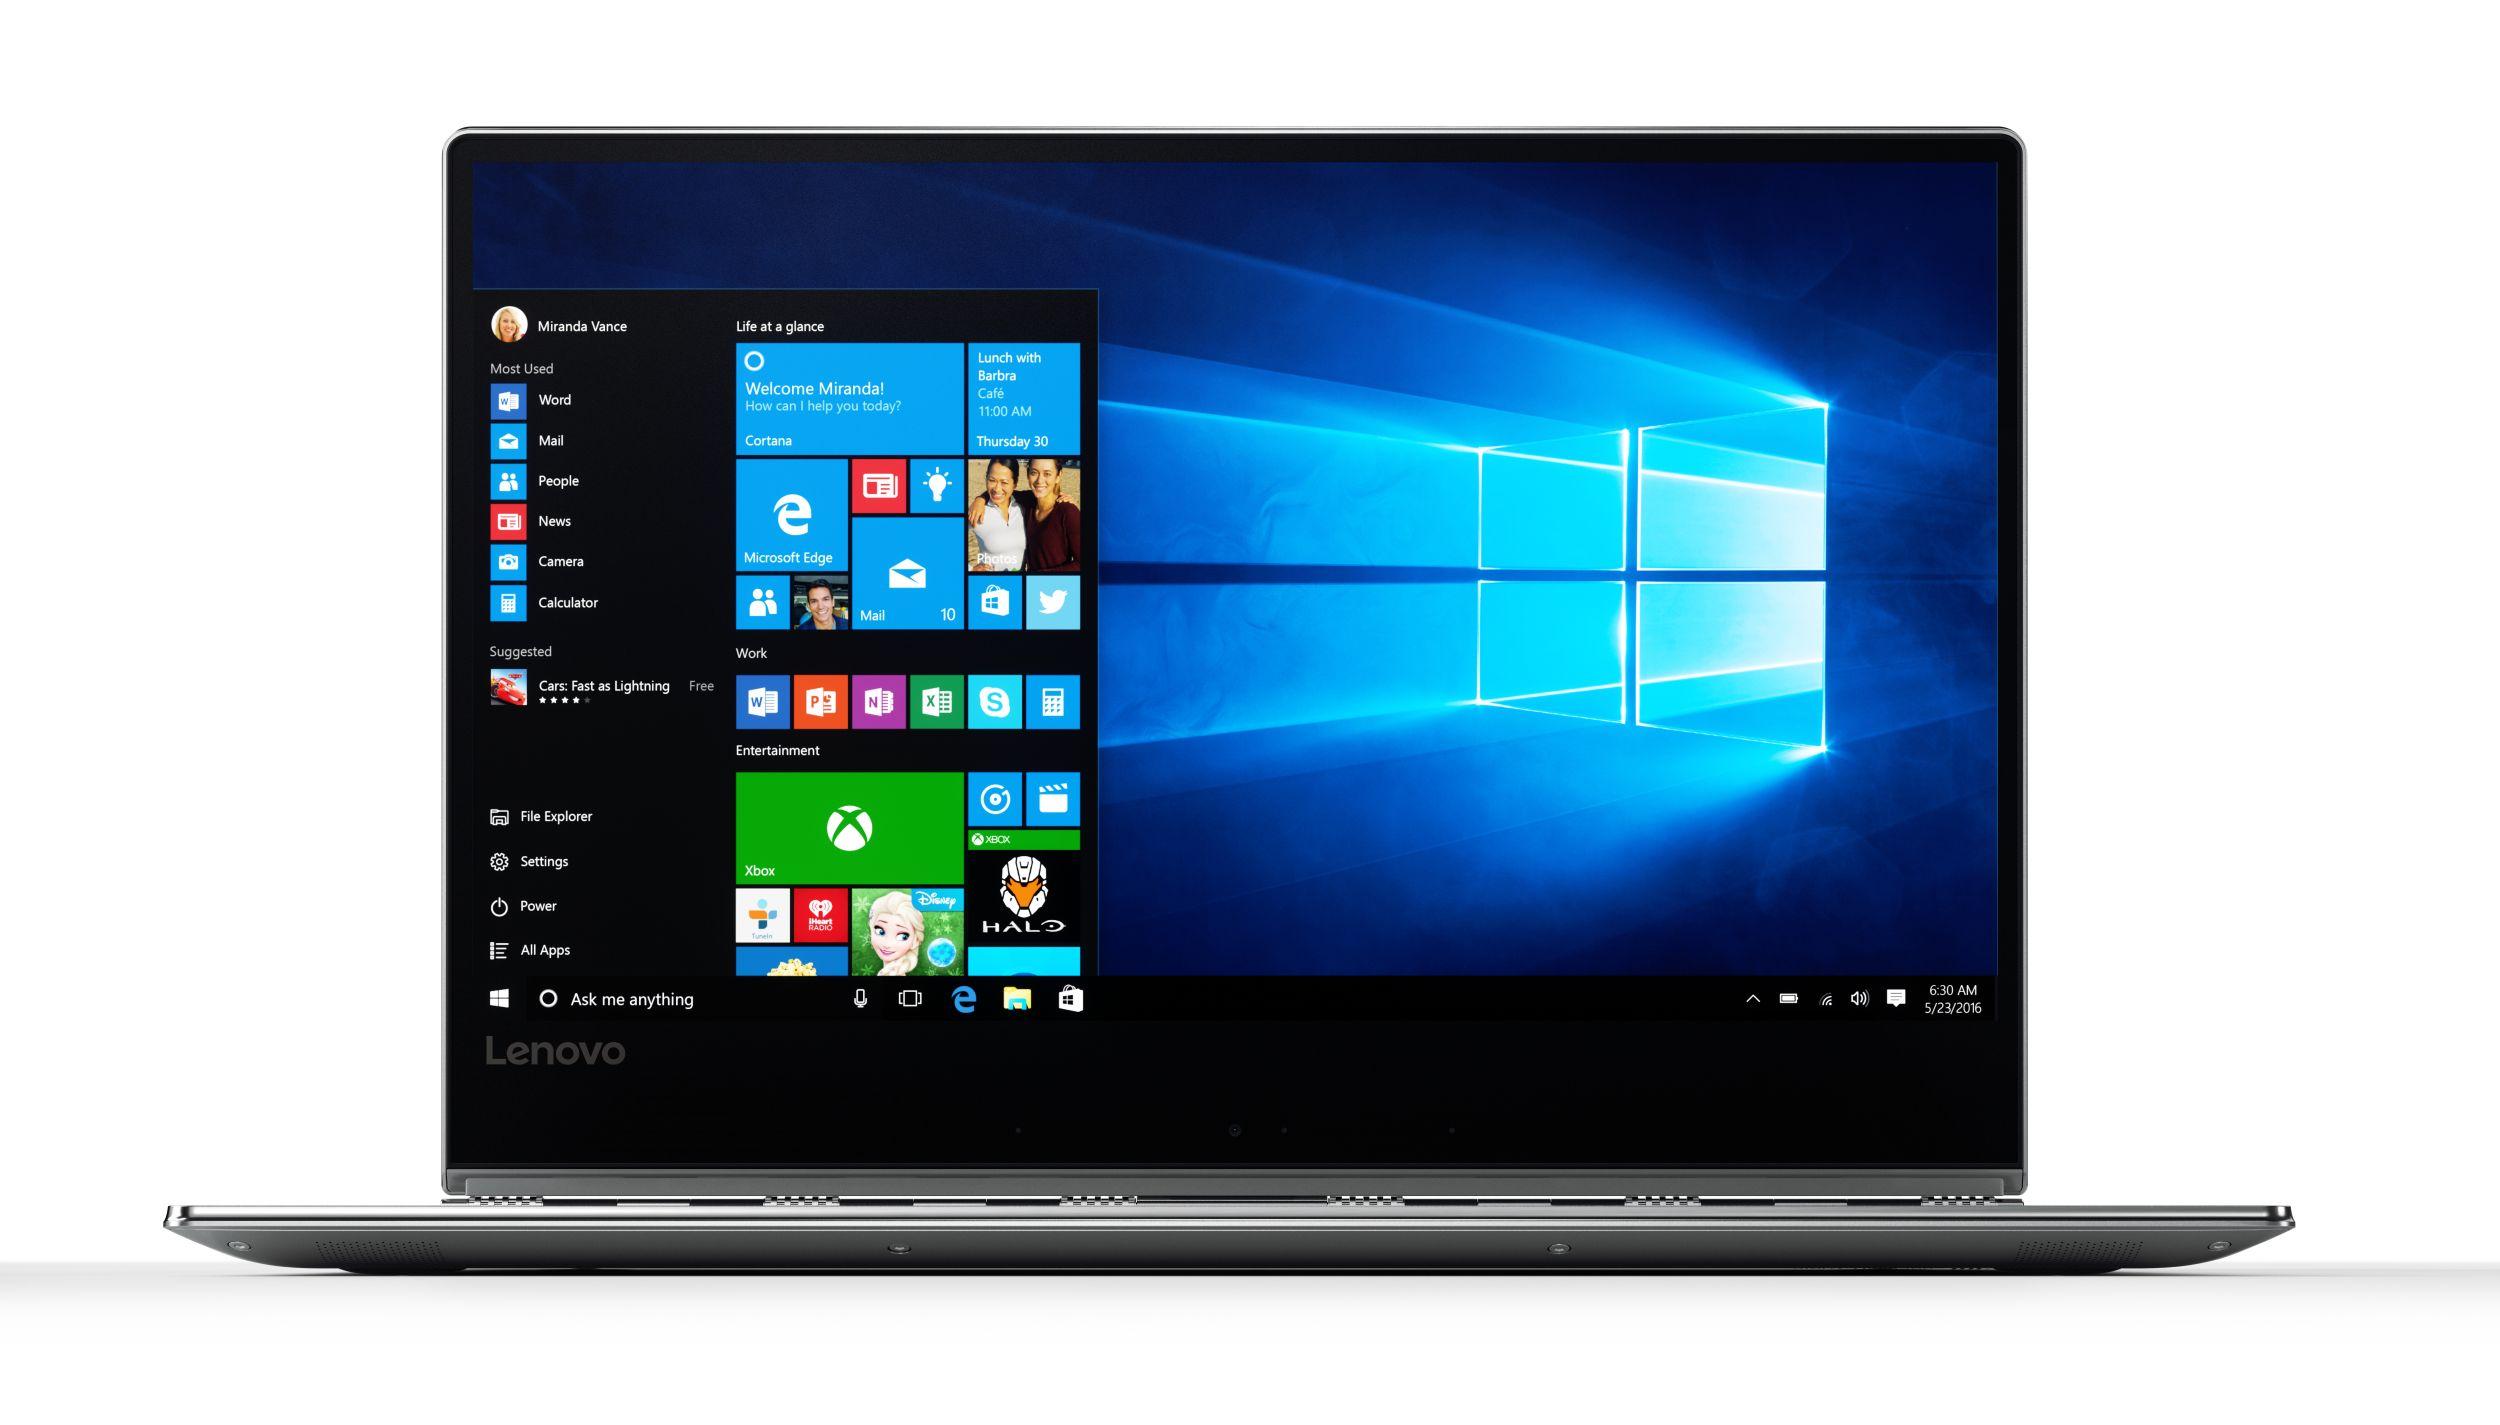 "Lenovo Yoga 910 13,9""UHD/i7-7500U/512/16G/Win 10 Silver 3Yrs"